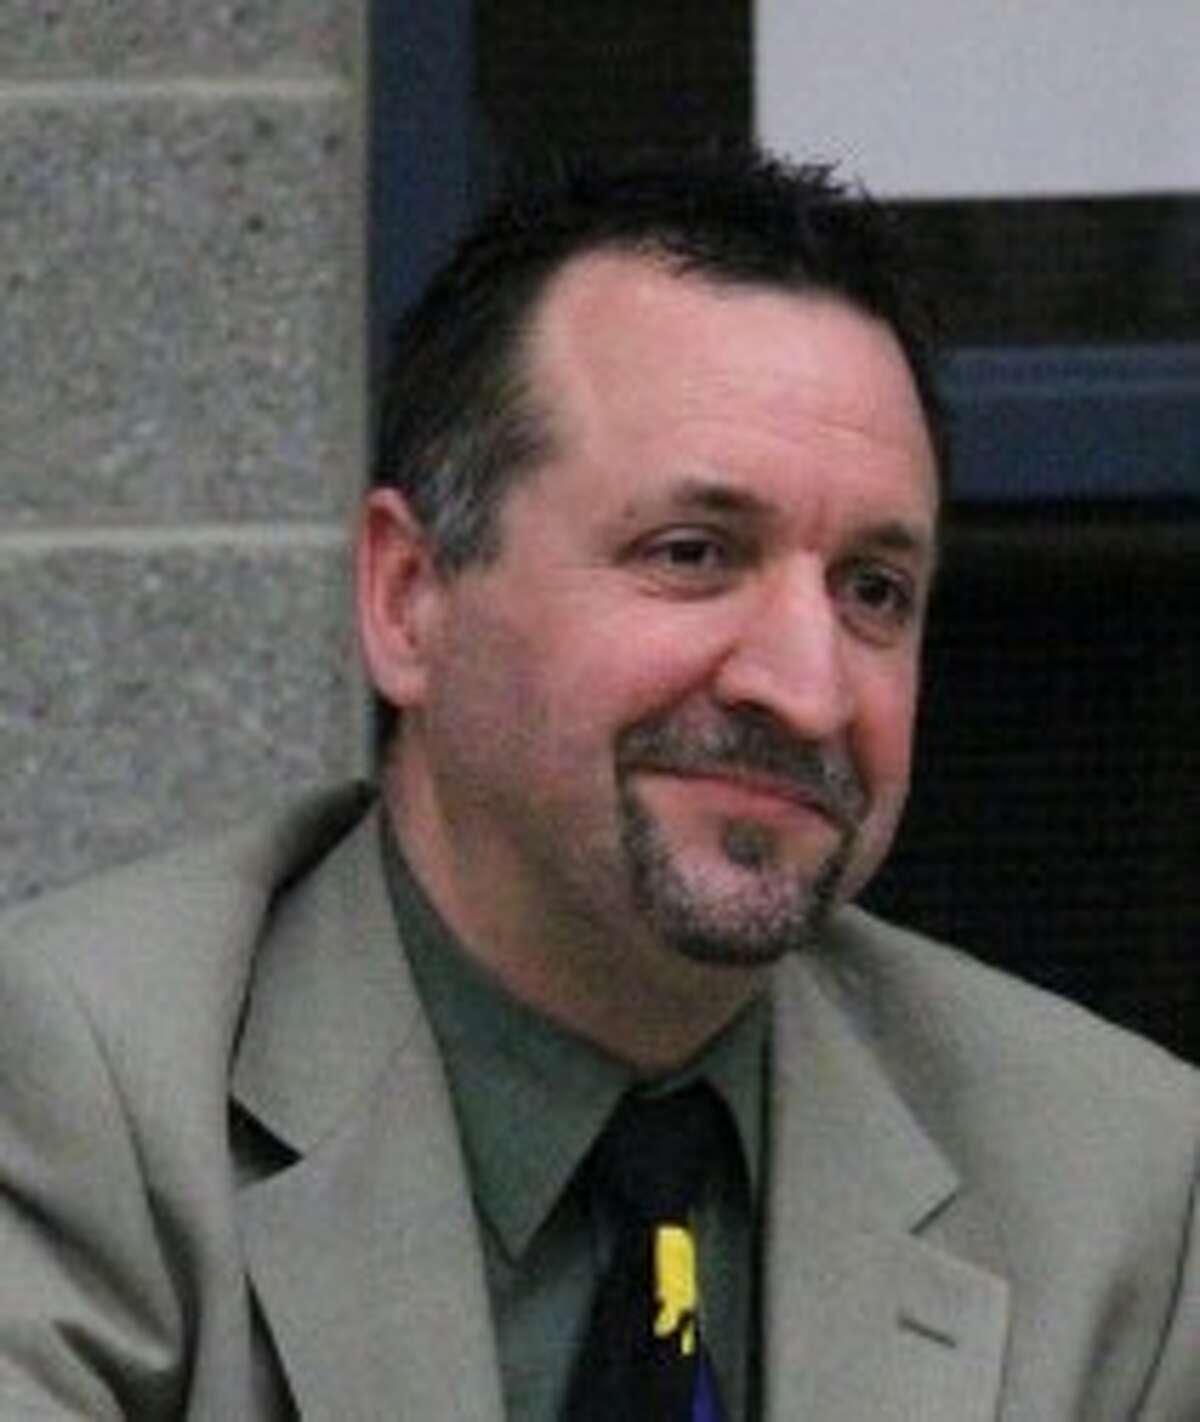 MSCS Superintendent Roger Cole